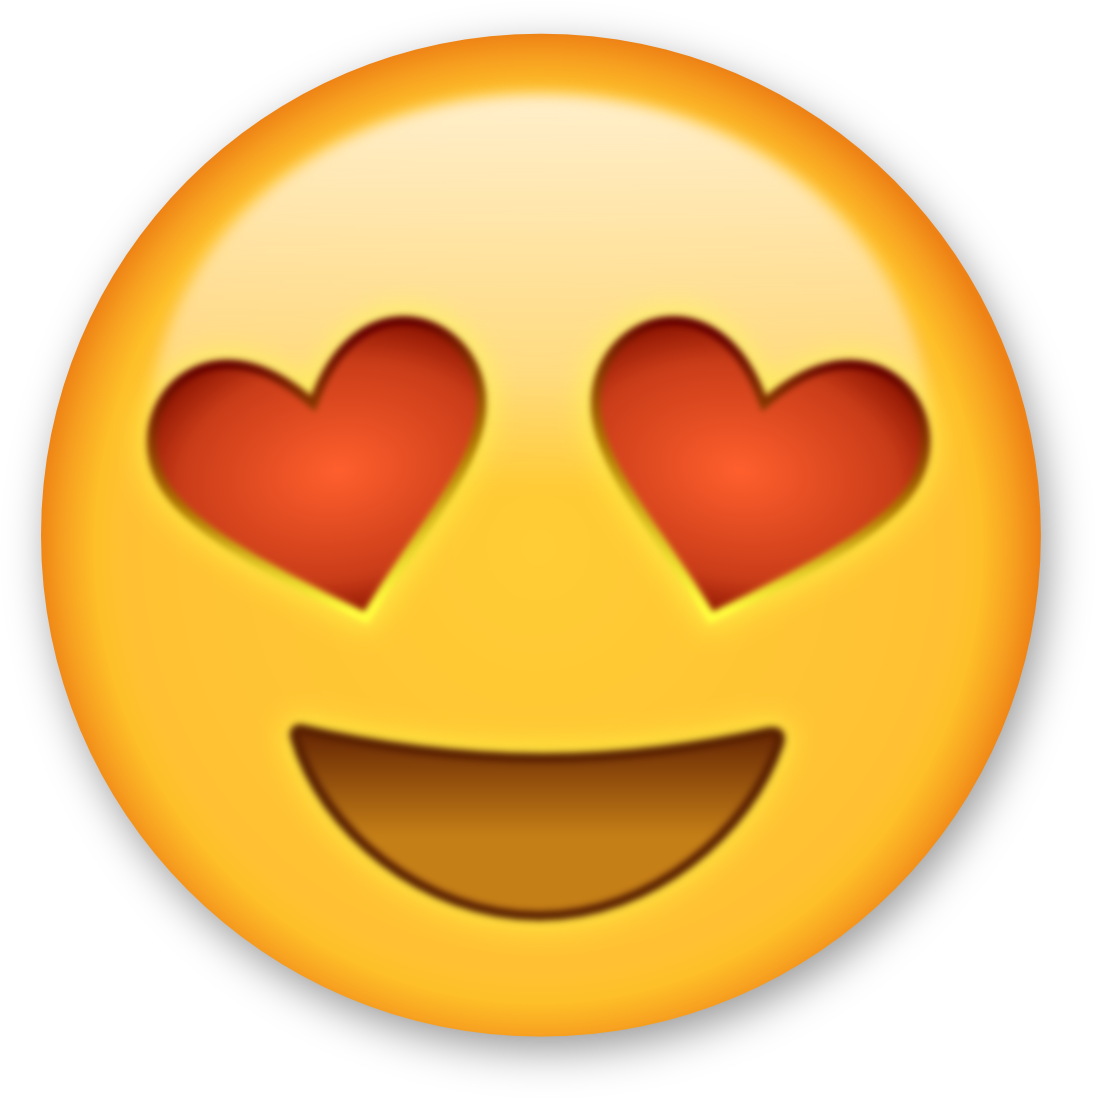 Heart Eyes Emoji Clipart | Free download best Heart Eyes Emoji